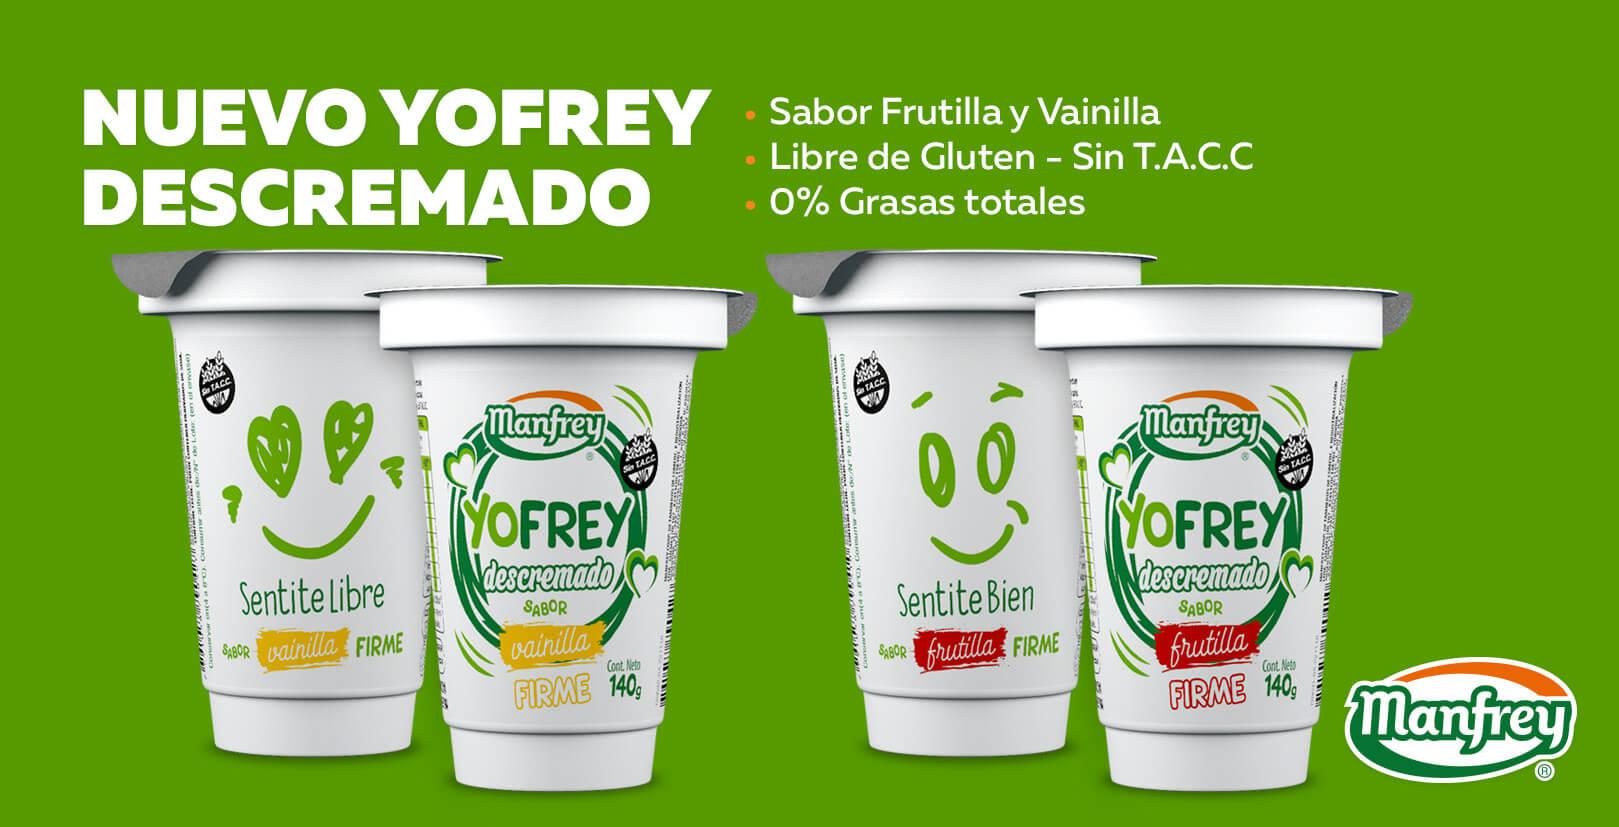 Yogurt Yofrey Dietético Descremado